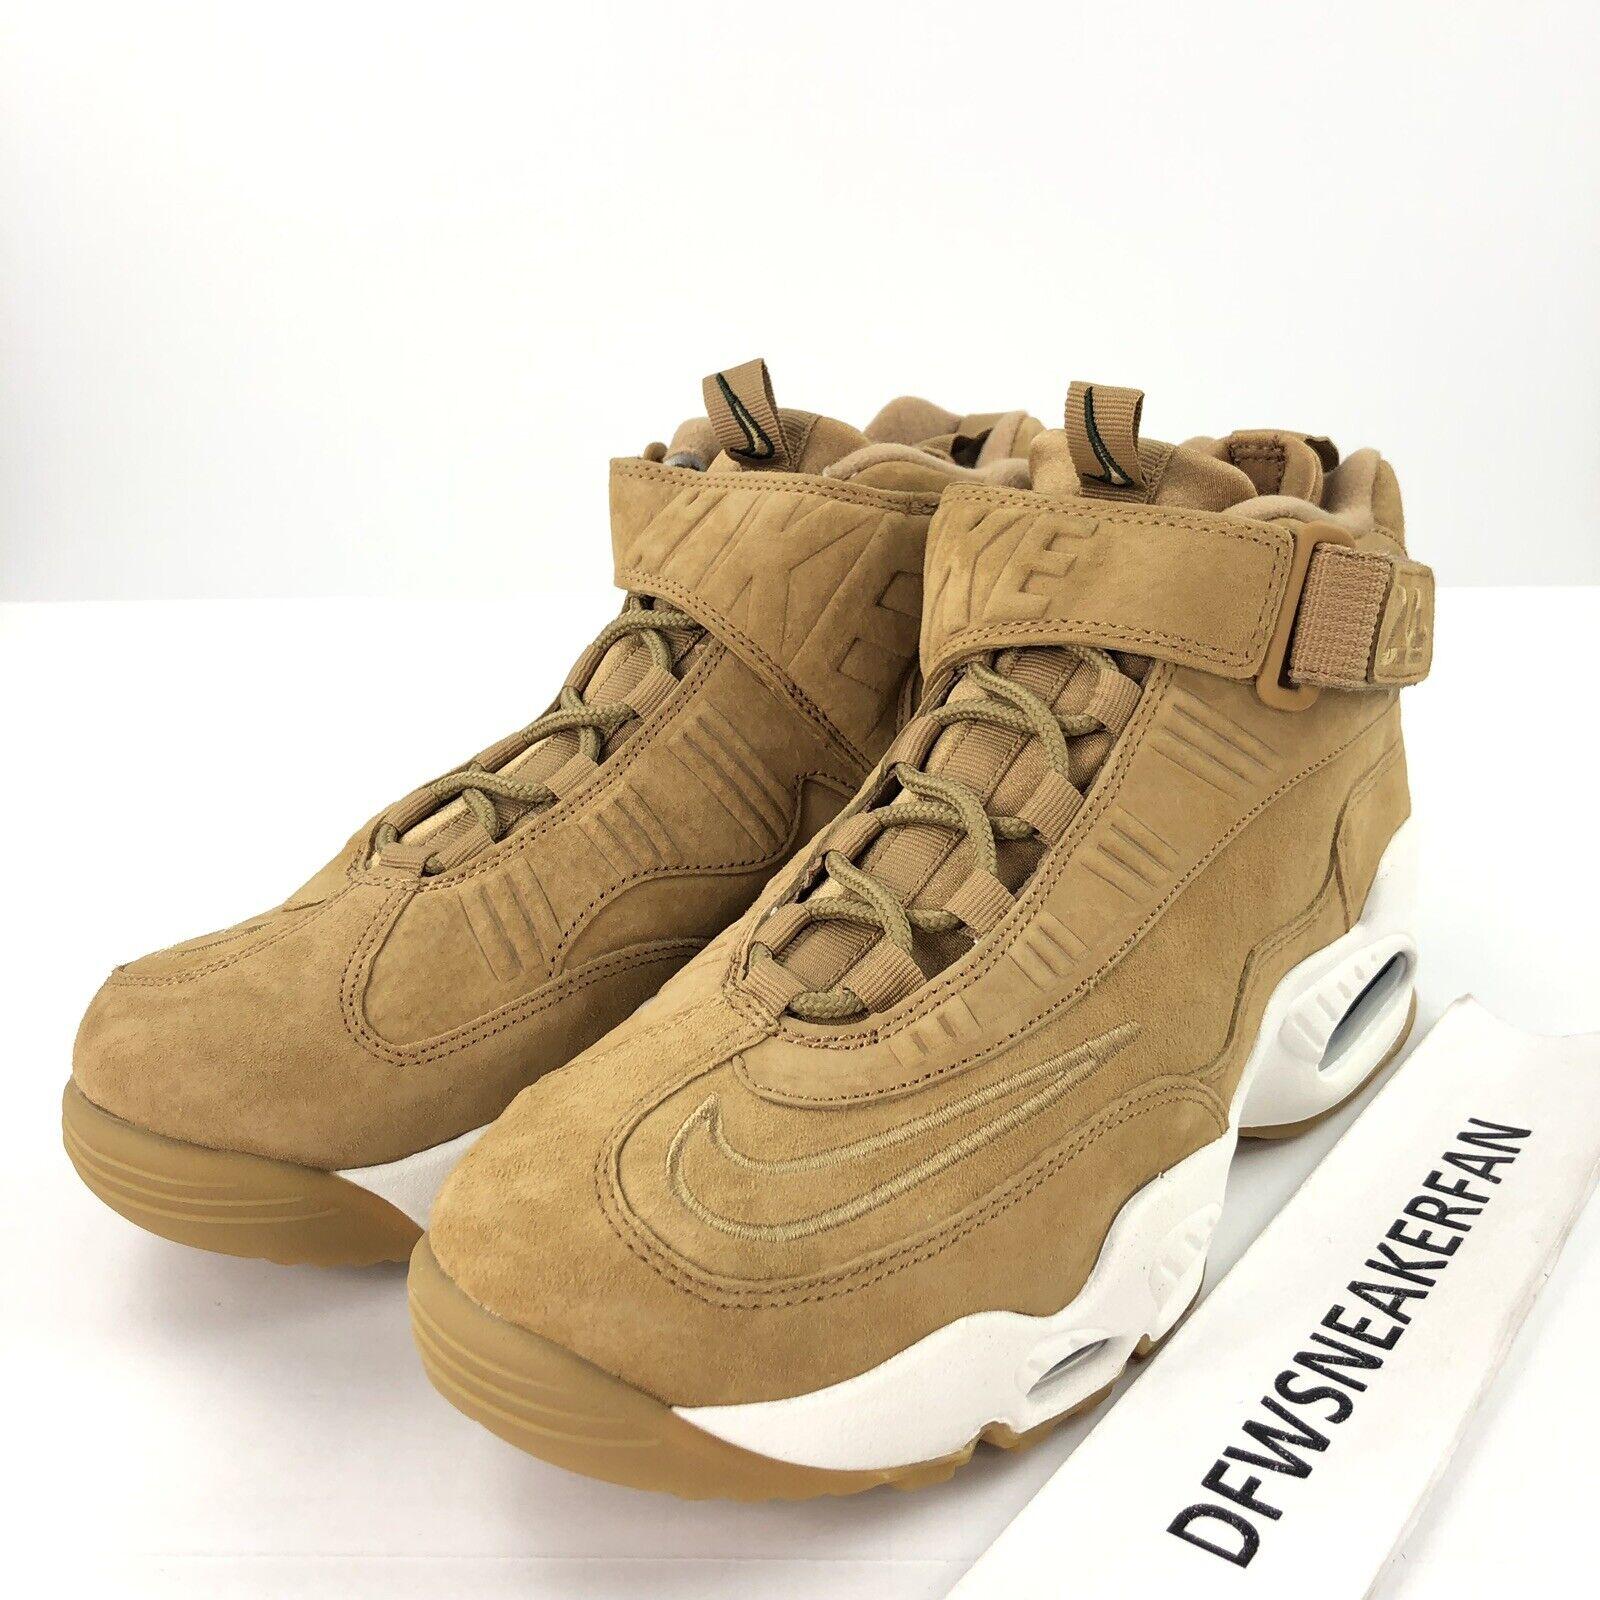 competitive price 7ef76 62c69 Nike Air Griffey Max 1 Men s 9.5 Wheat Tan Flax Sail shoes 354912-200 Gum  shoes njutxk7021-Men s Athletic Shoes